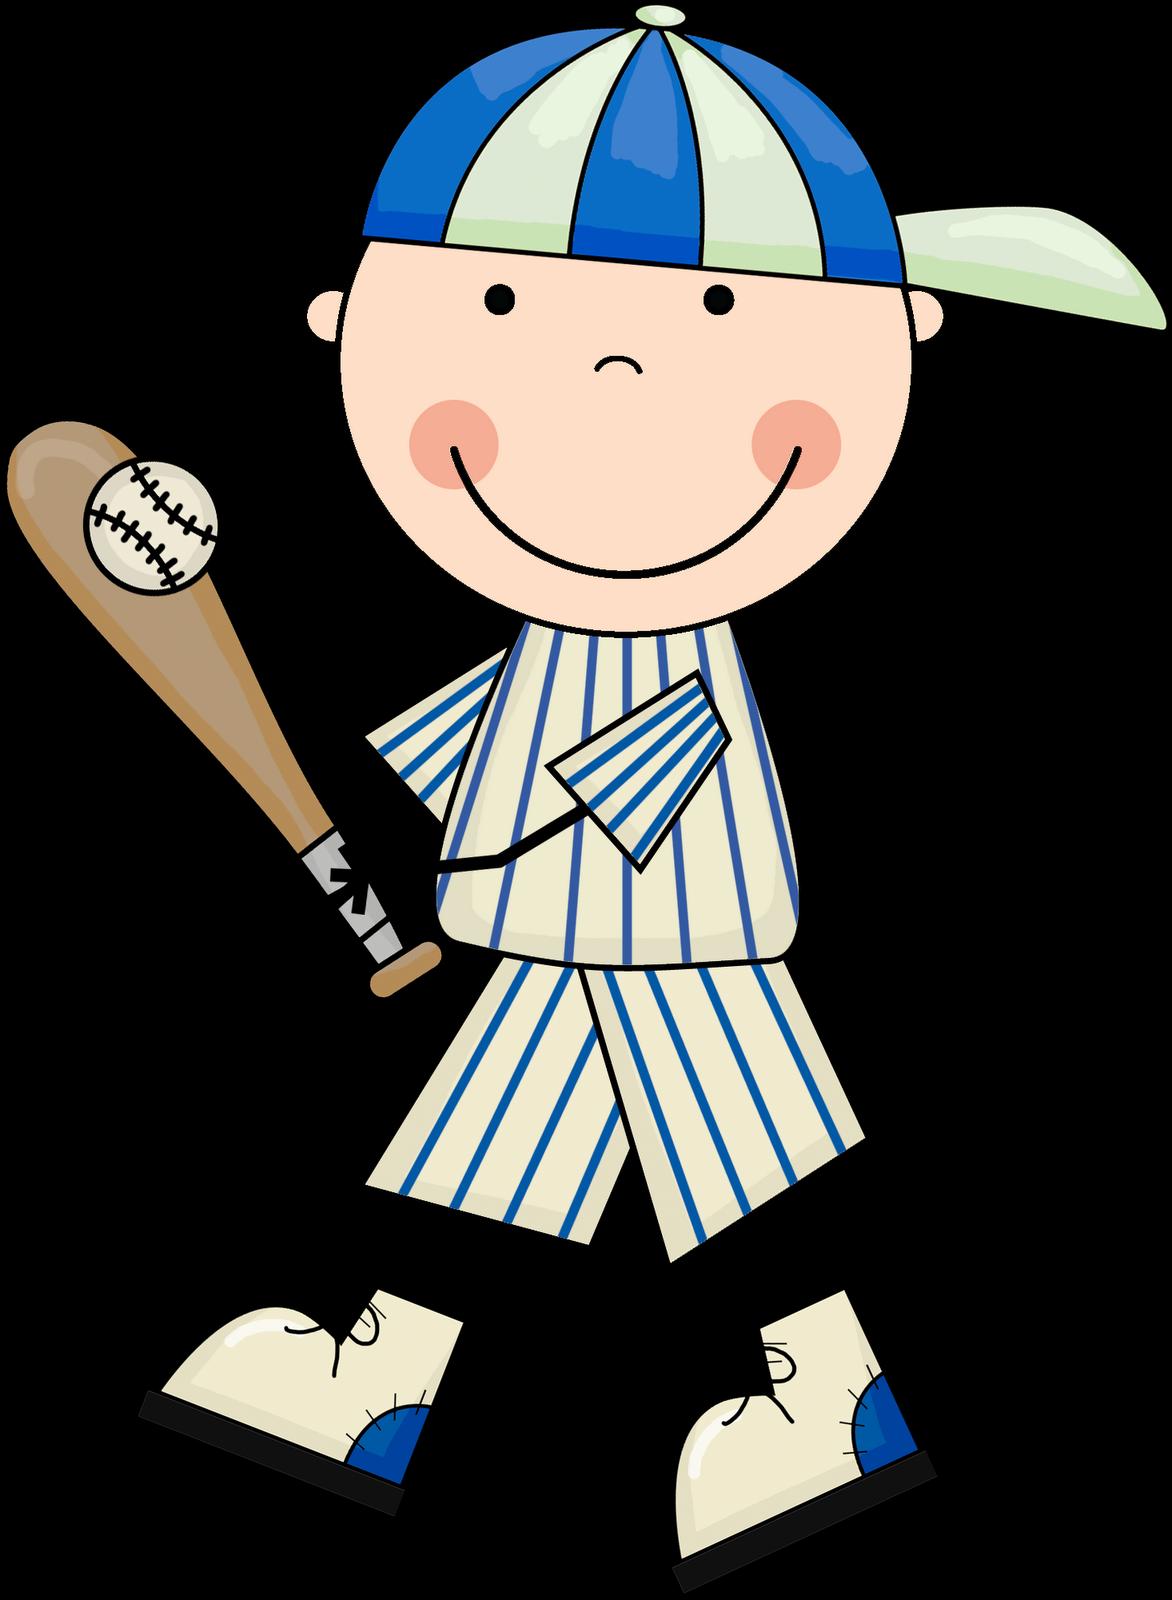 Baseball Pictures Clip Art School Clipar-Baseball Pictures Clip Art School Clipart-10